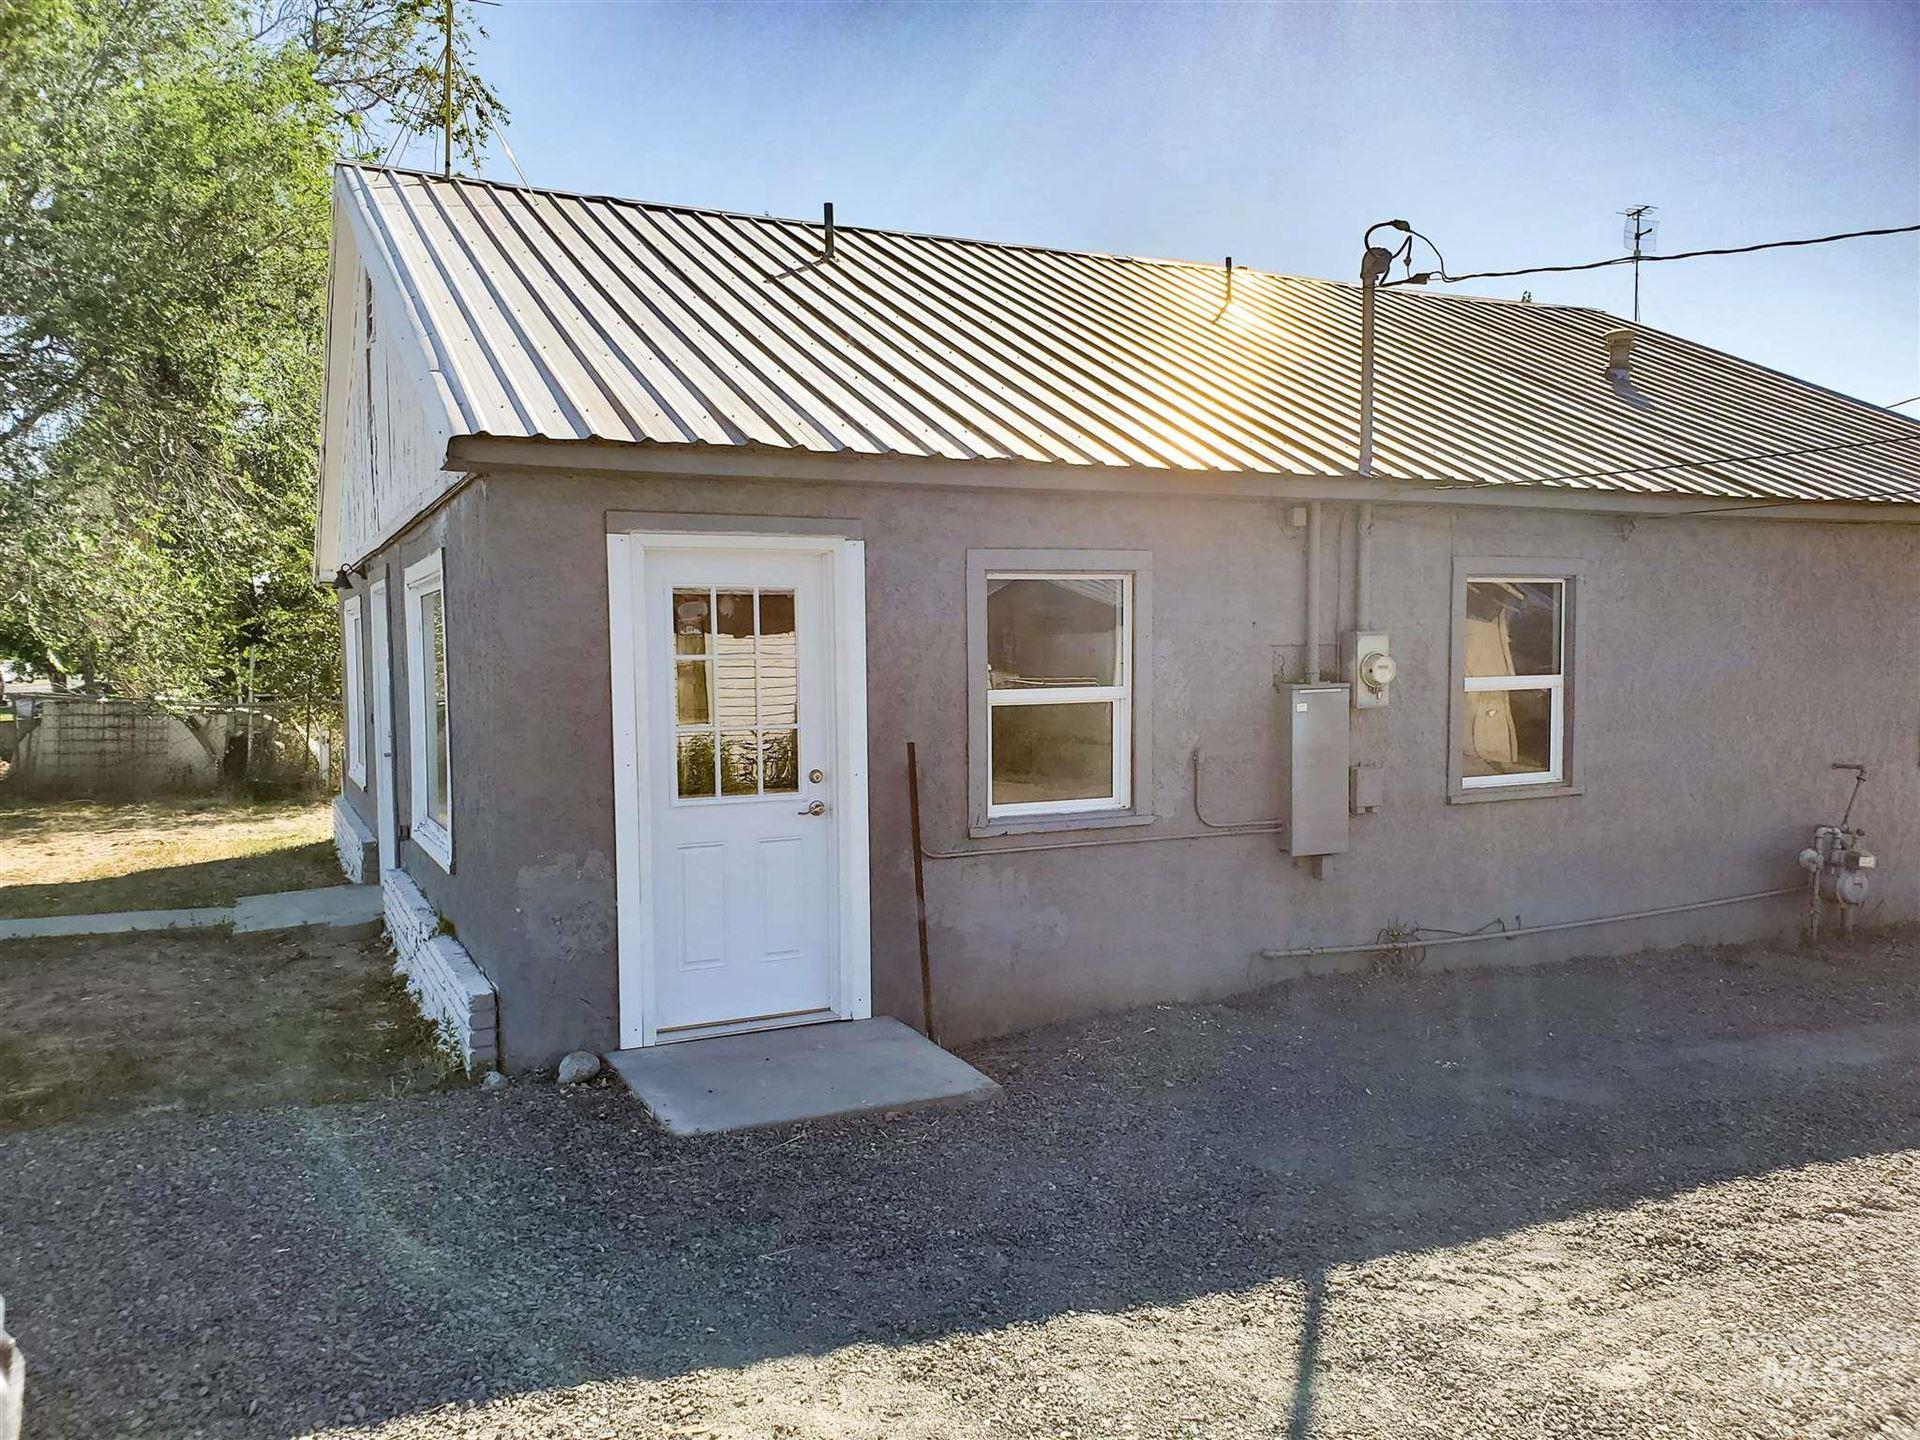 Photo of 714 Linden Street, Buhl, ID 83316 (MLS # 98772650)